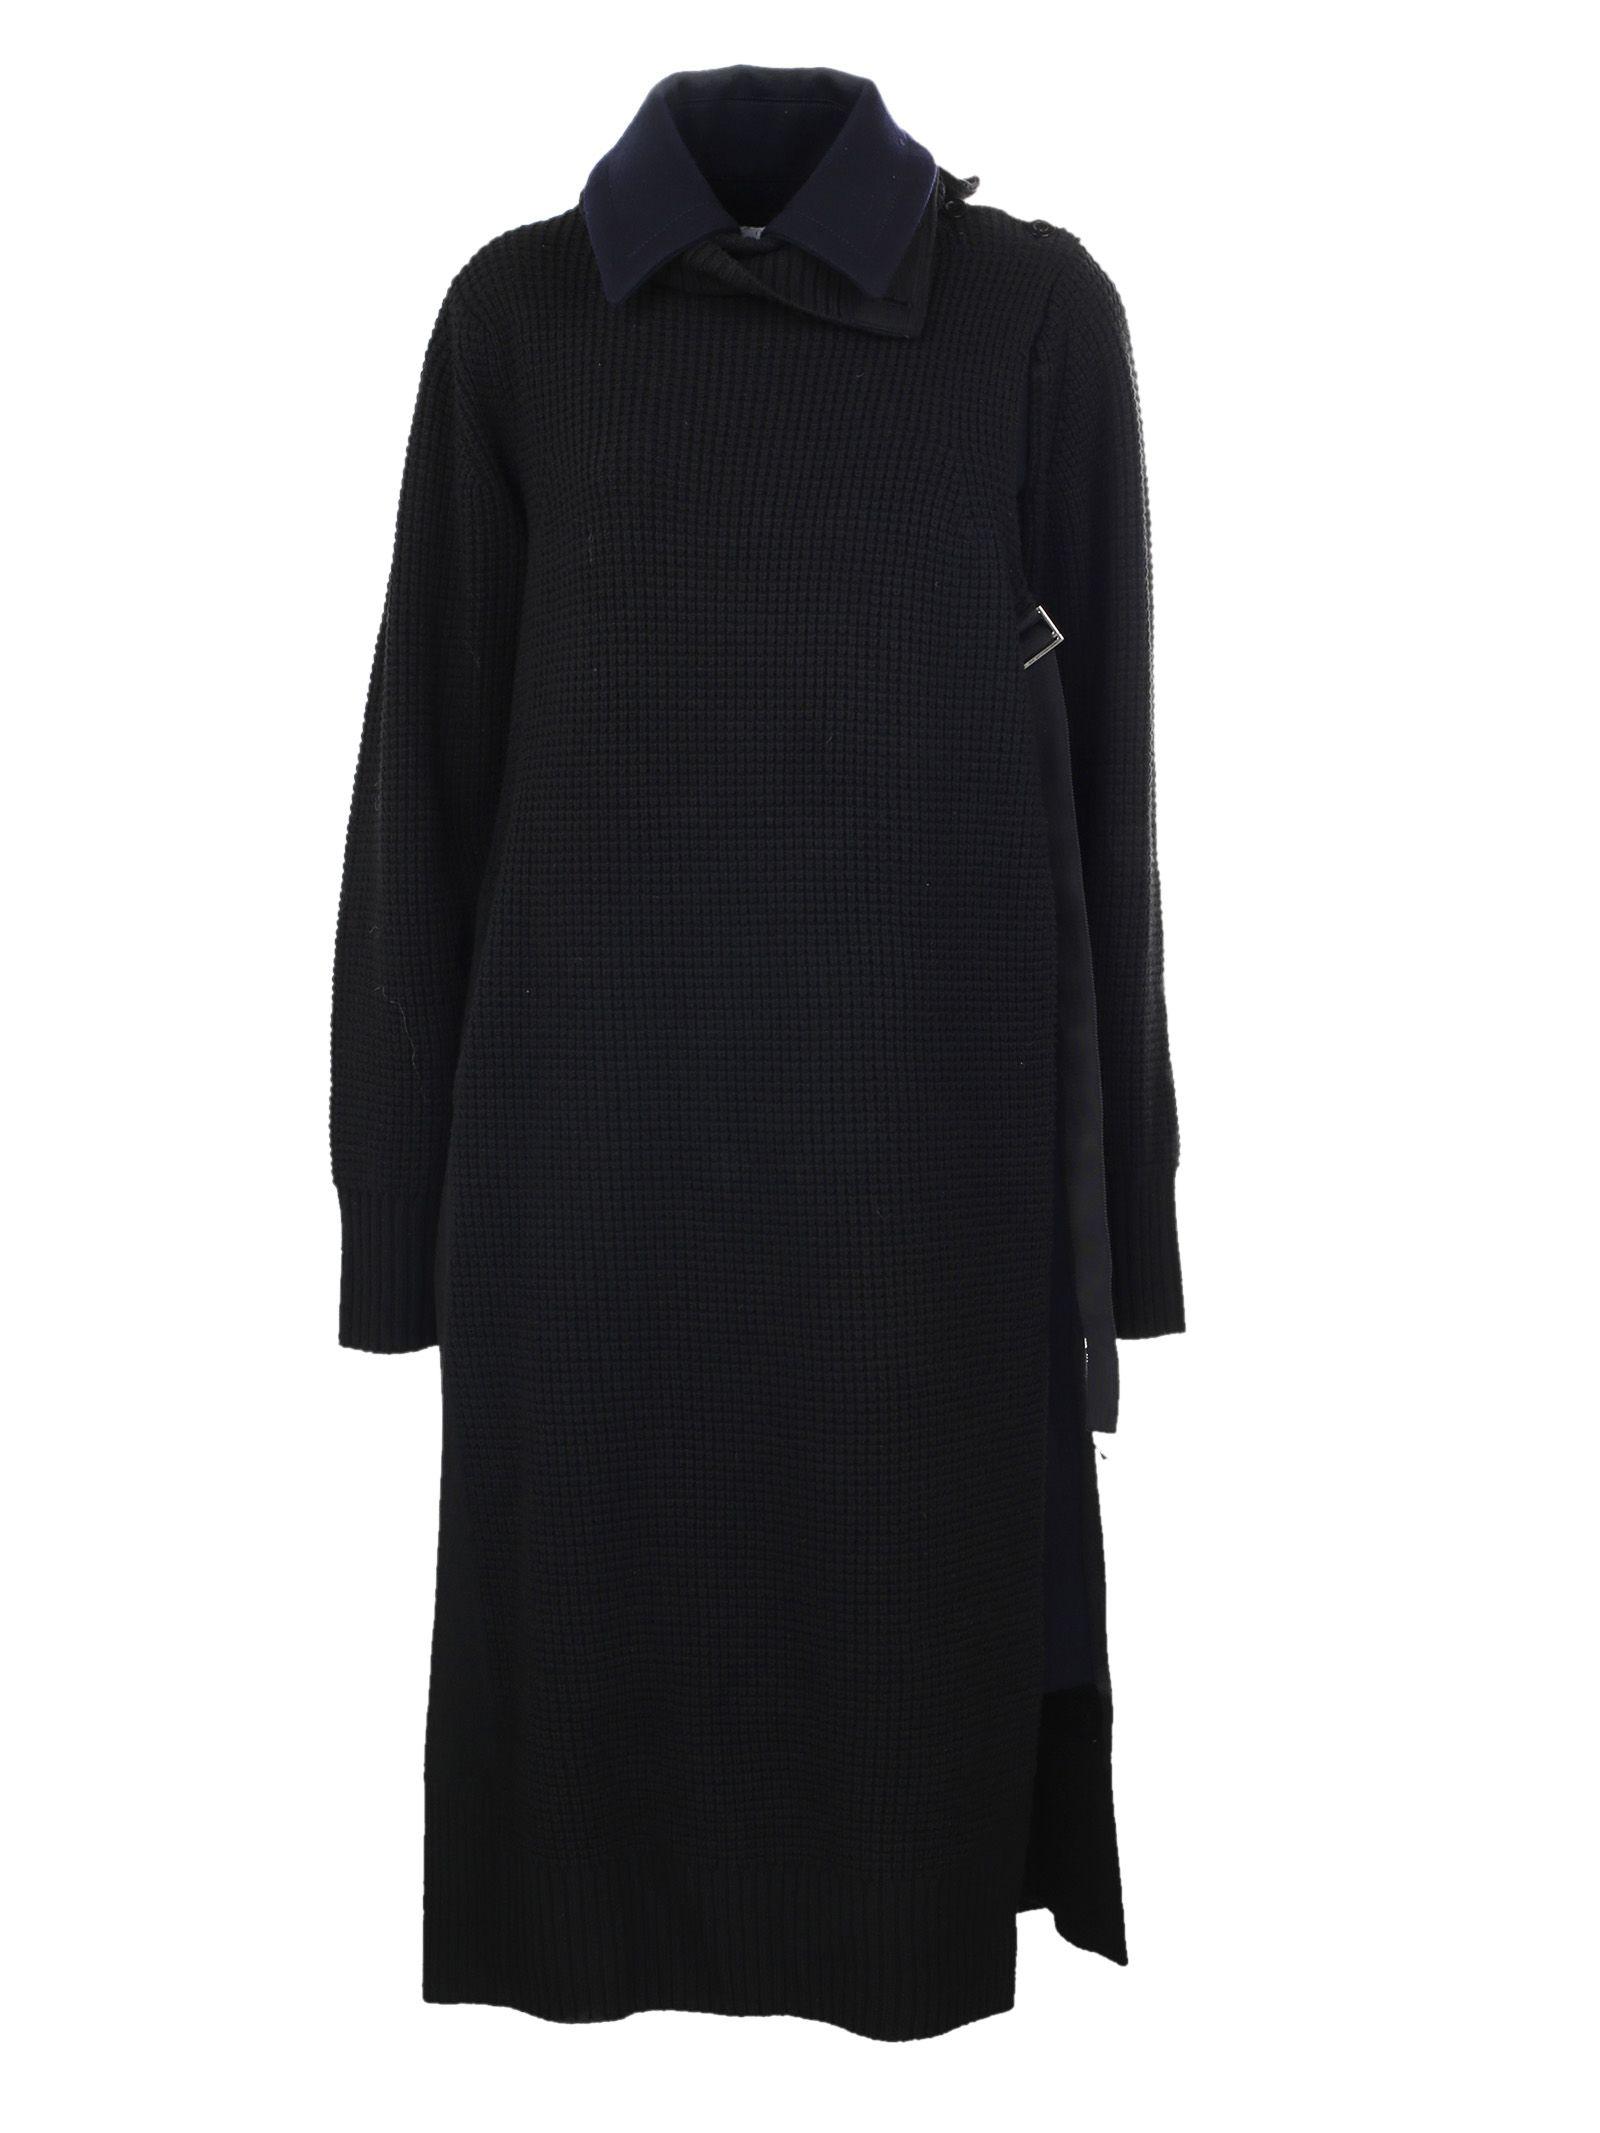 Sacai Cardigan Overlay Coat